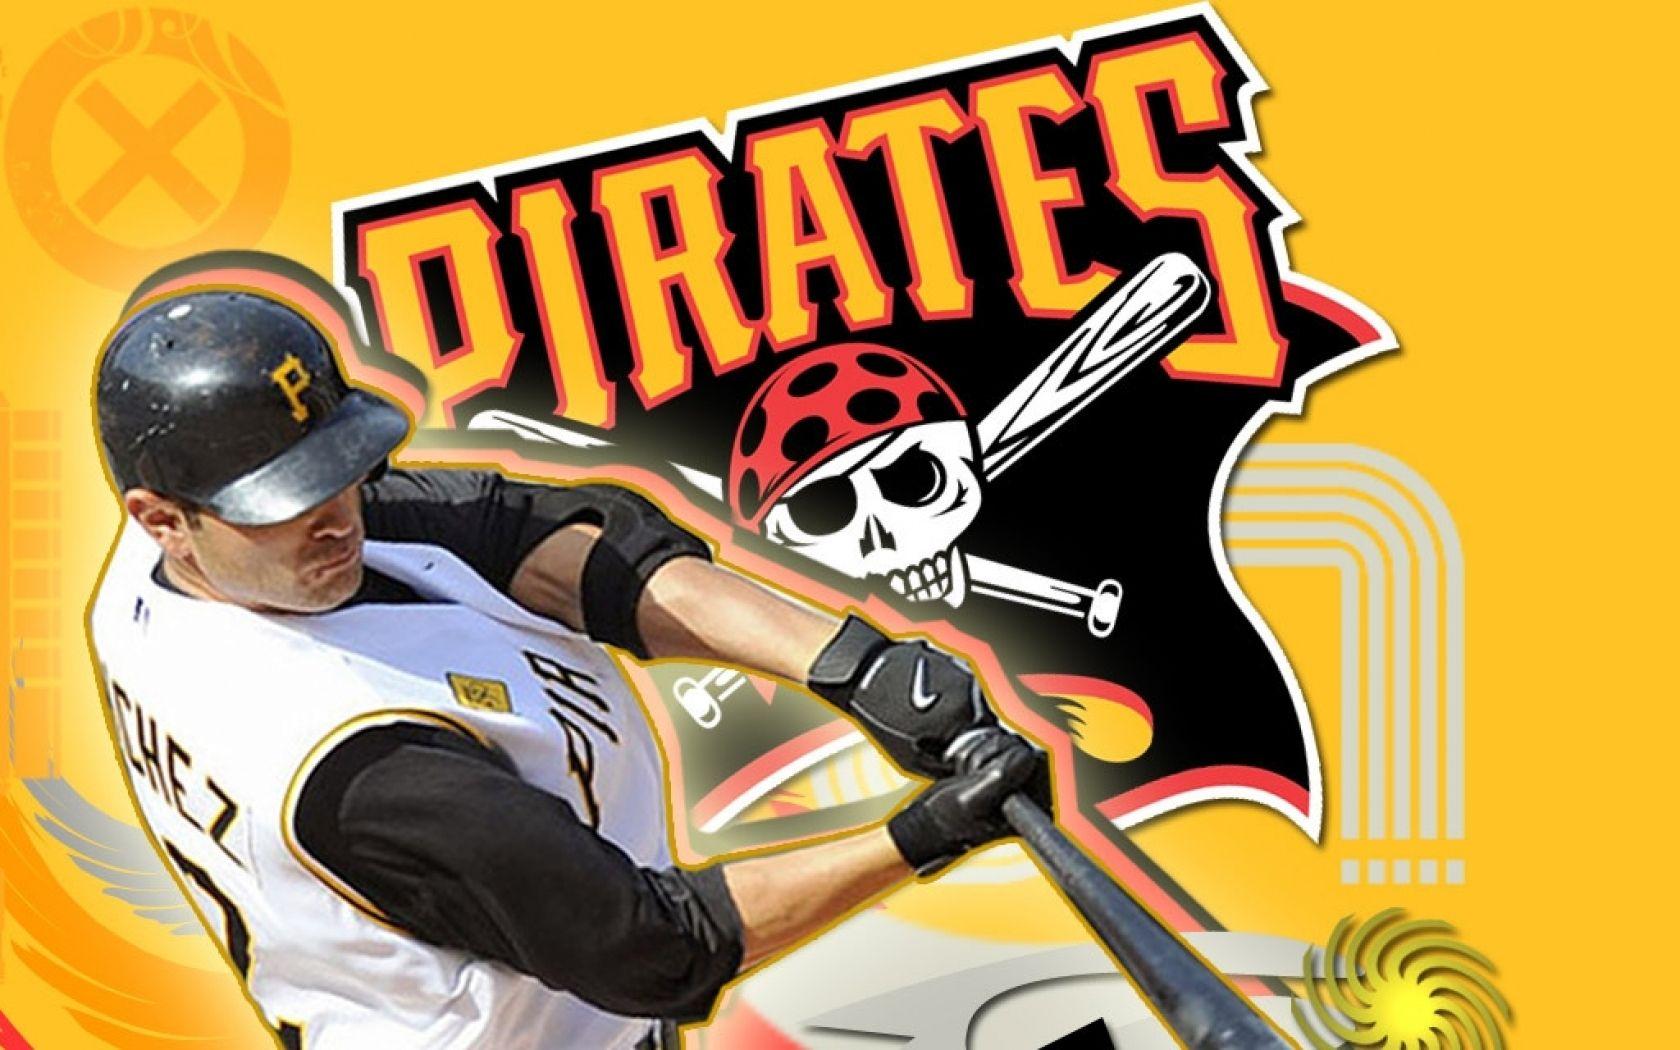 Pittsburgh Pirates Wallpaper baseball_desktop_wallpapers